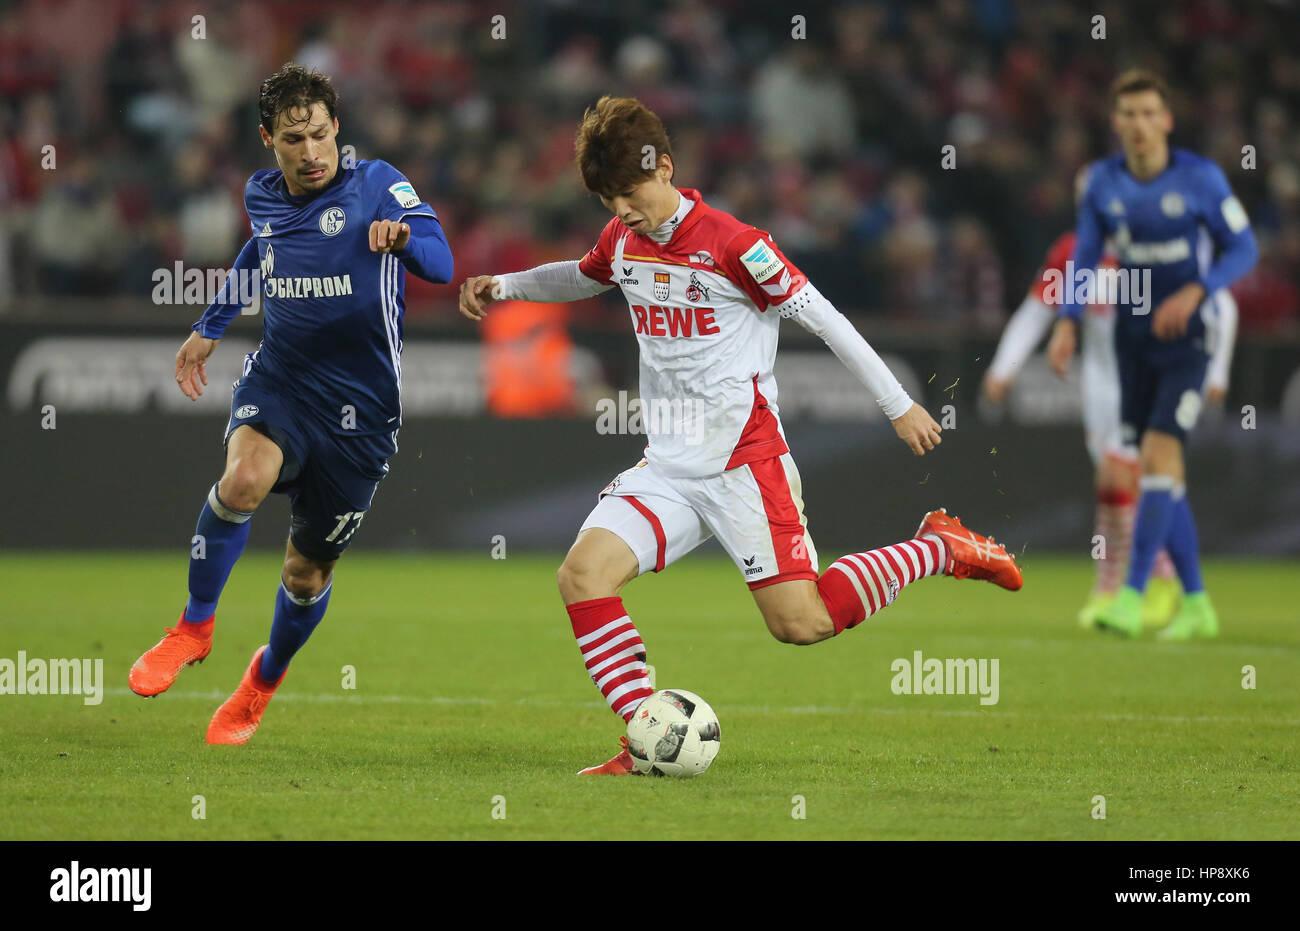 Cologne, Germany, February 19, 2017, Bundesliga matchday 21, 1. FC Koeln - FC Schalke 04:  Tackling Benjamin Stambouli - Stock Image